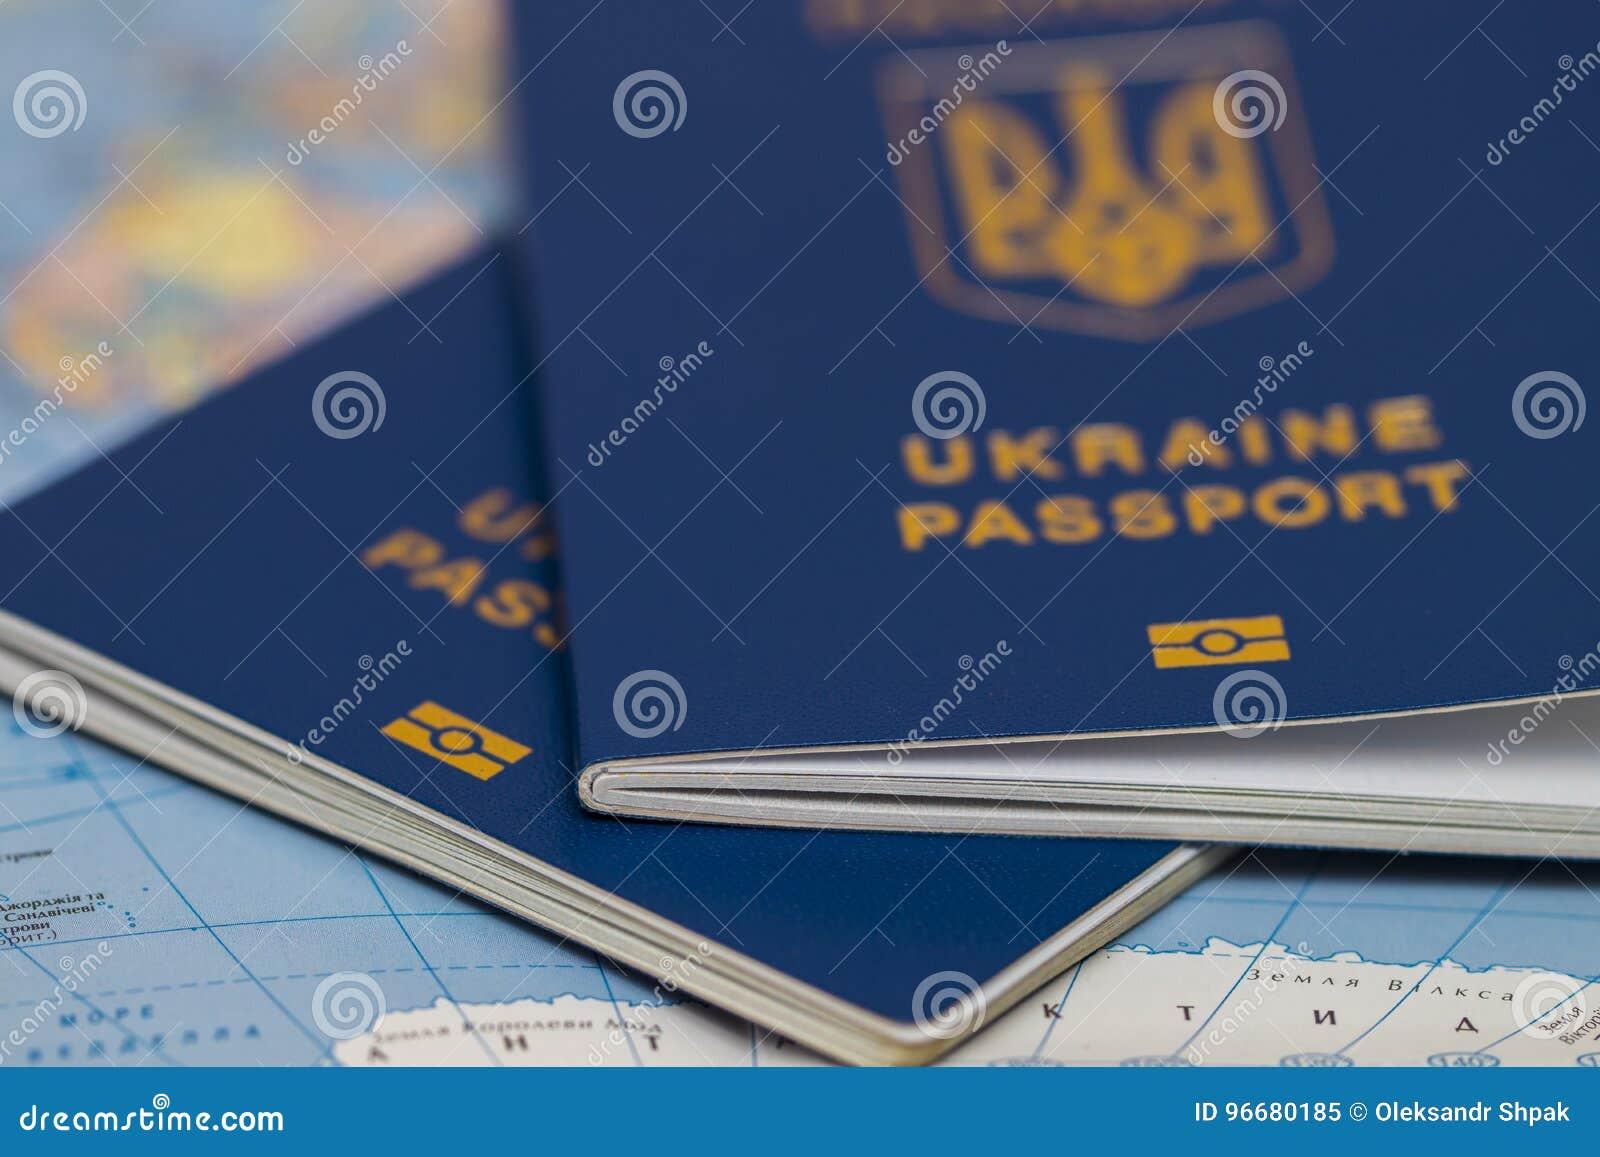 Ukrainian Travel Passport On A World Map Stock Image - Image ...